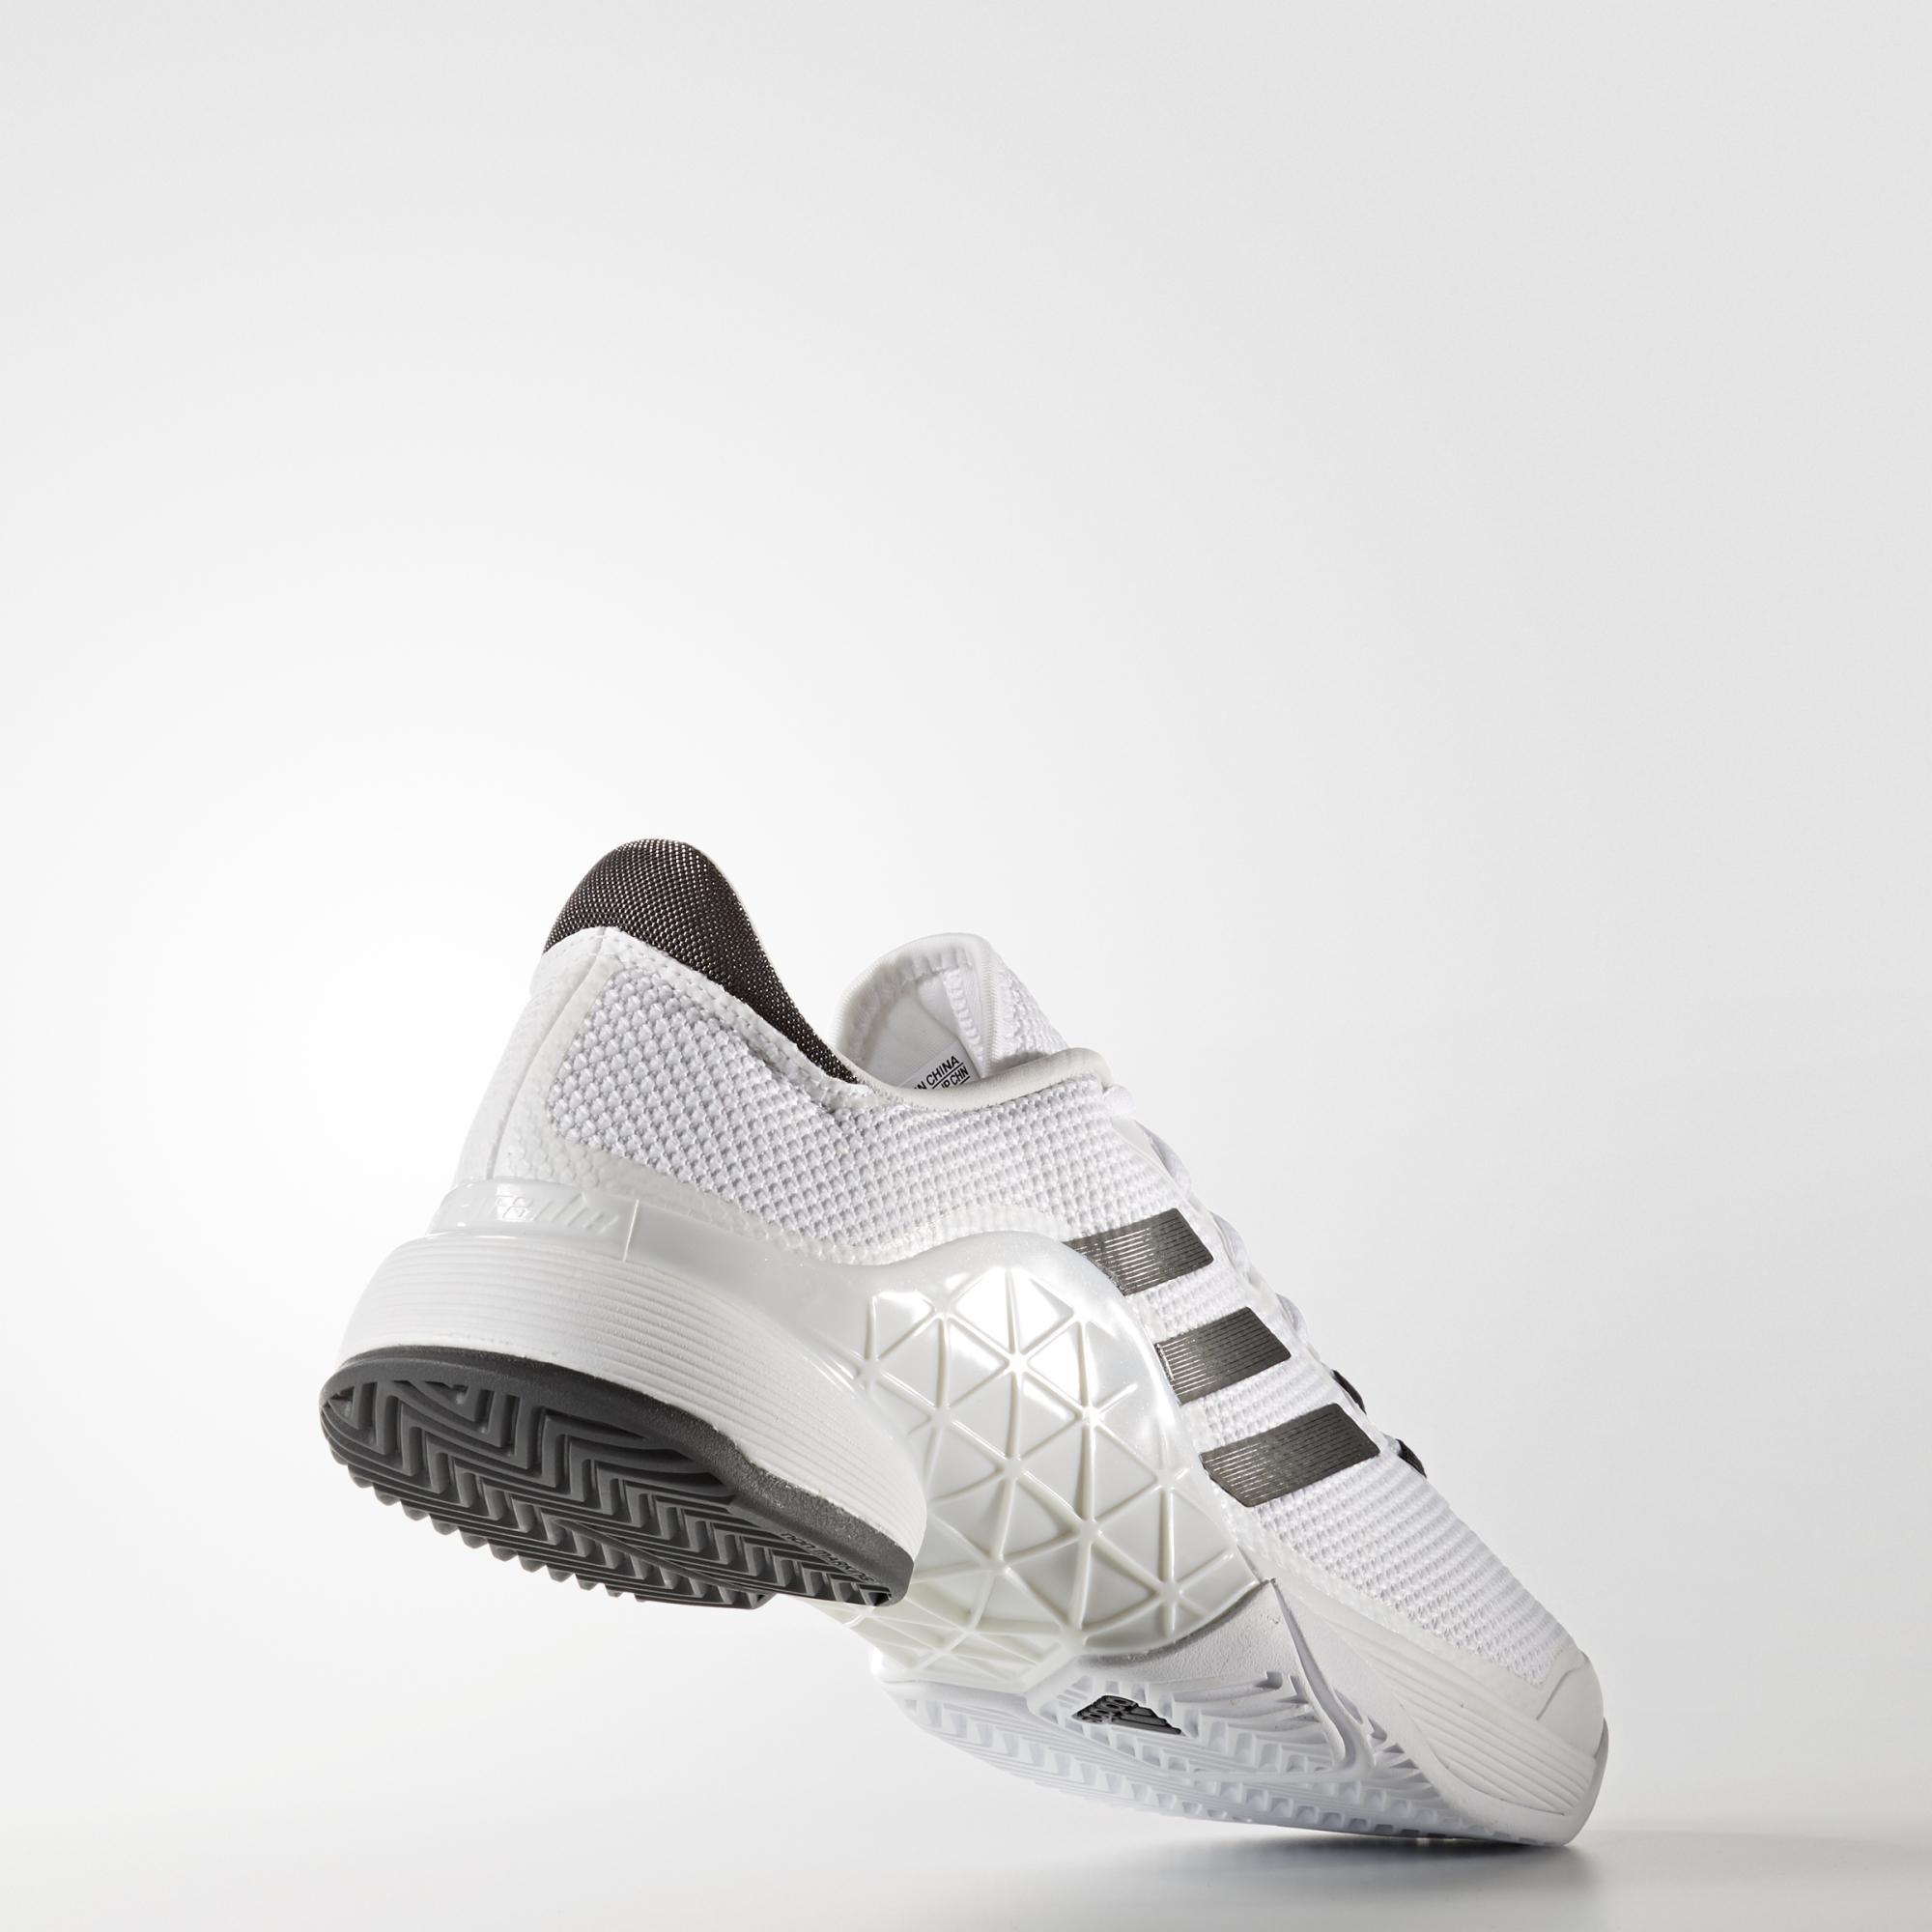 adidas mens barricata 2017, scarpe da tennis bianco / grigio